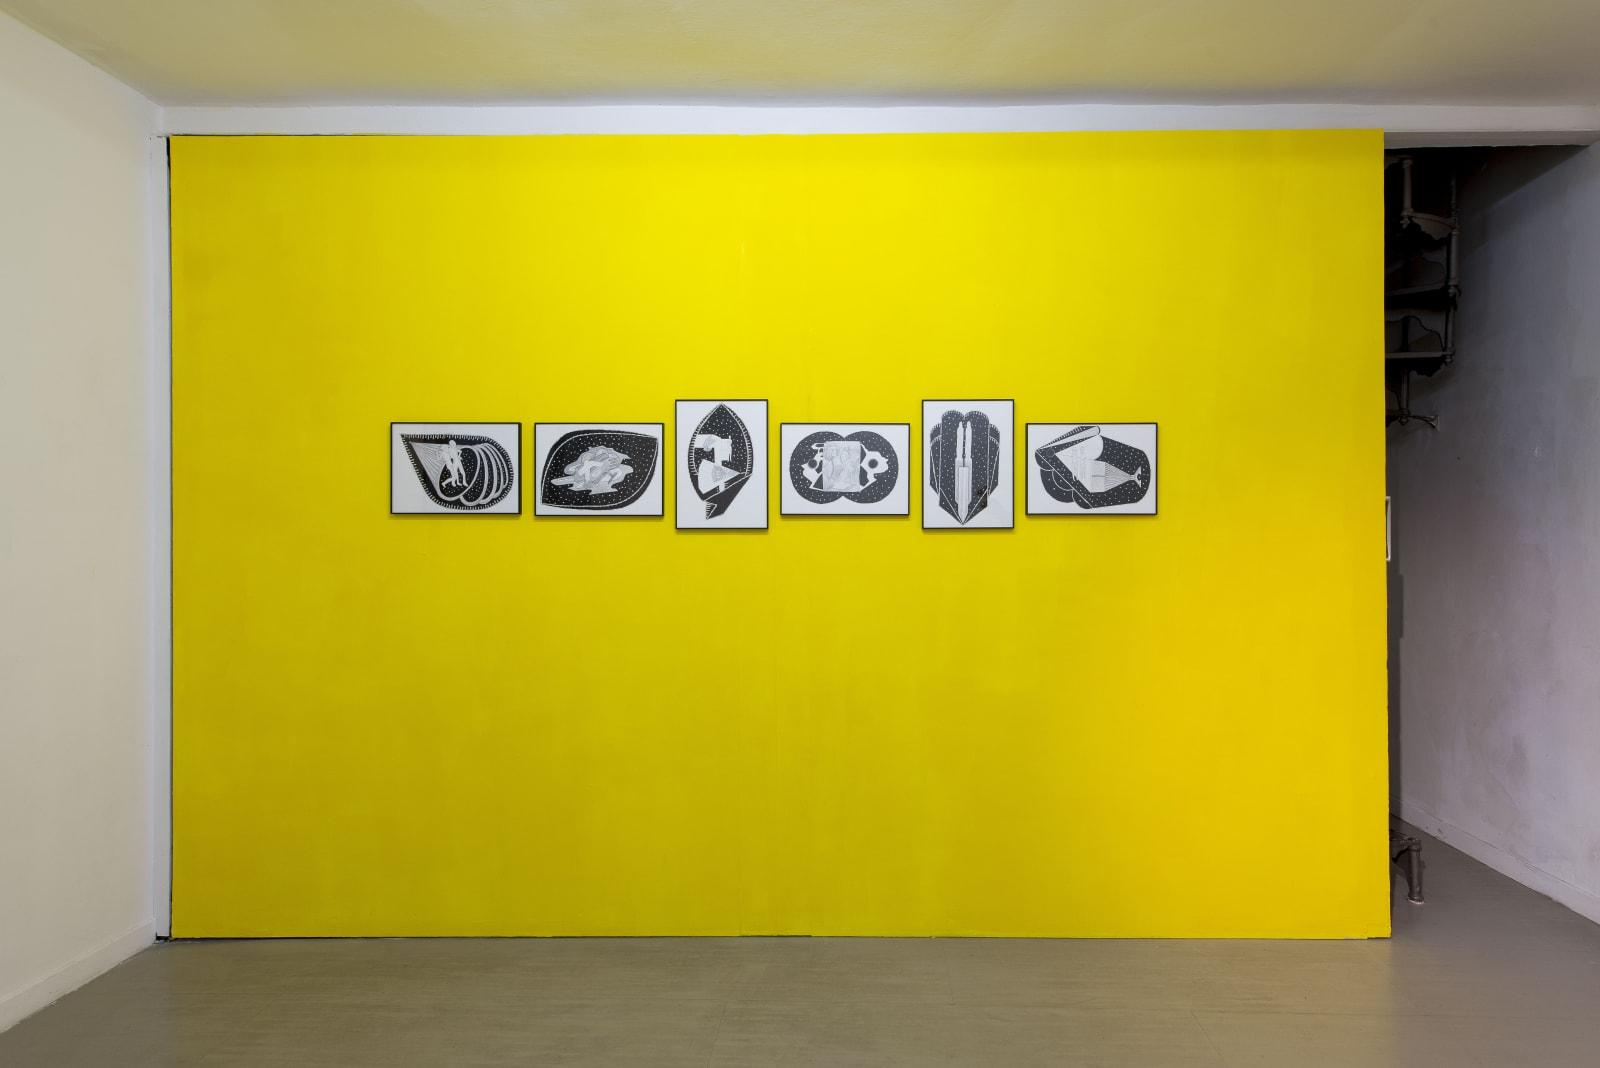 Hidden Beauty, Anna Hulačová, Krištof Kintera, Pavla Sceranková, Richard Wiesner, curated by Marina Dacci and Krištof Kintera, installation view, z2o Sara Zanin Gallery Rome